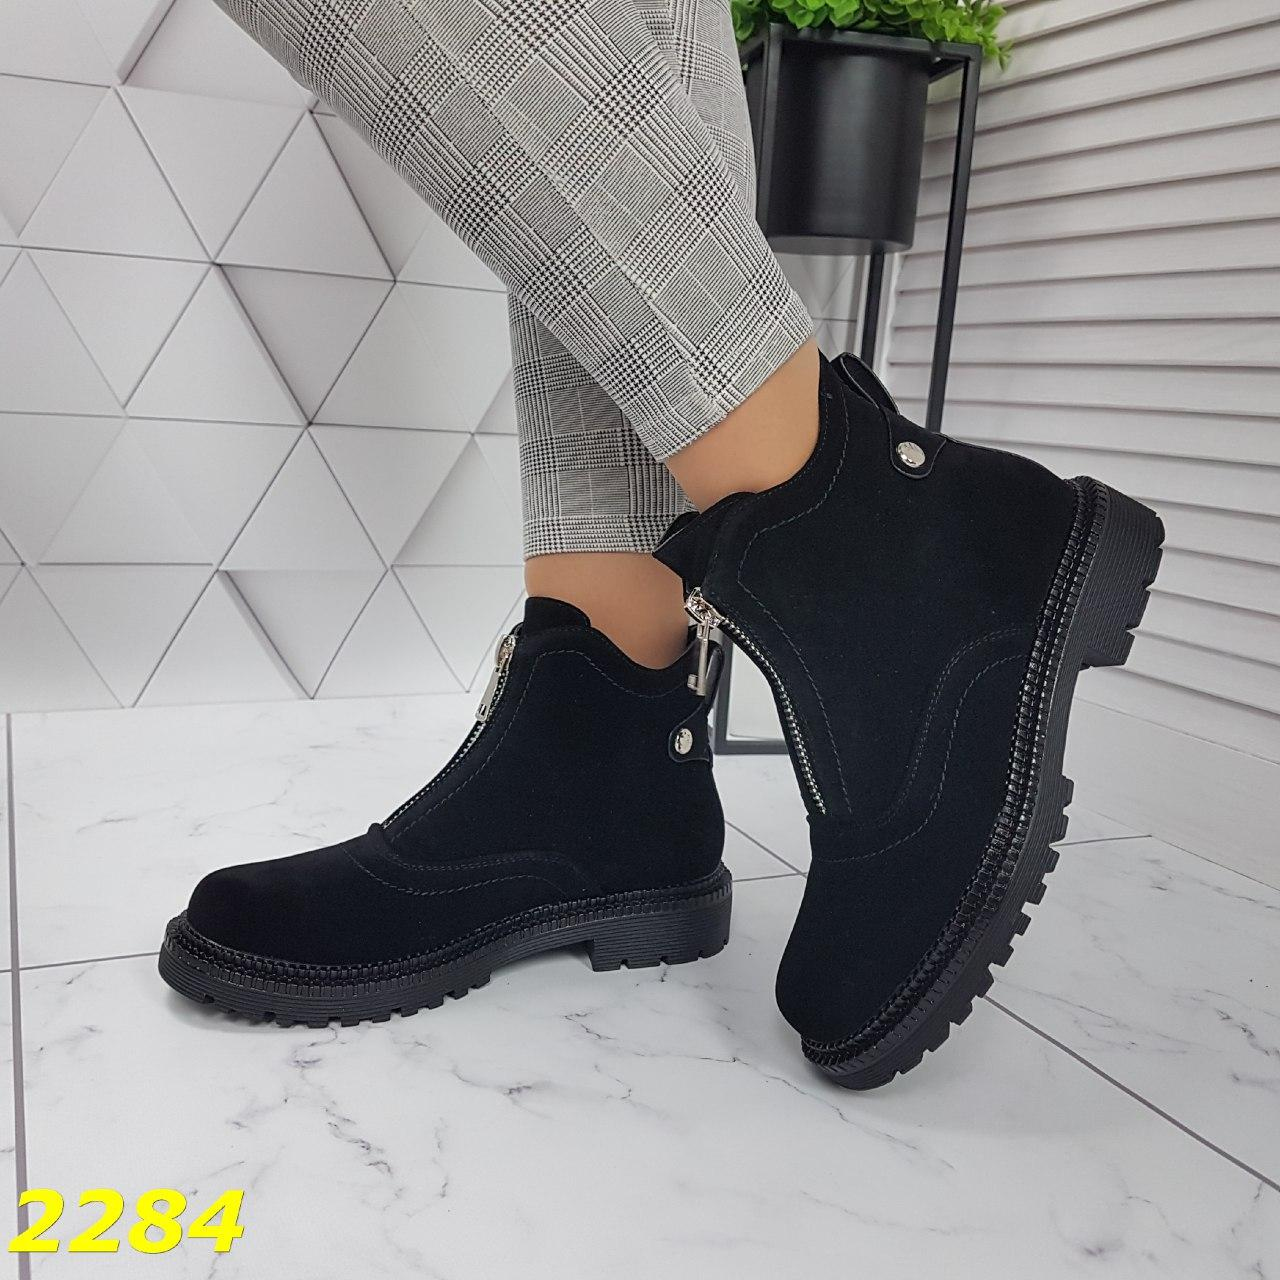 ботинки на каблуке, ботинки из экозамши